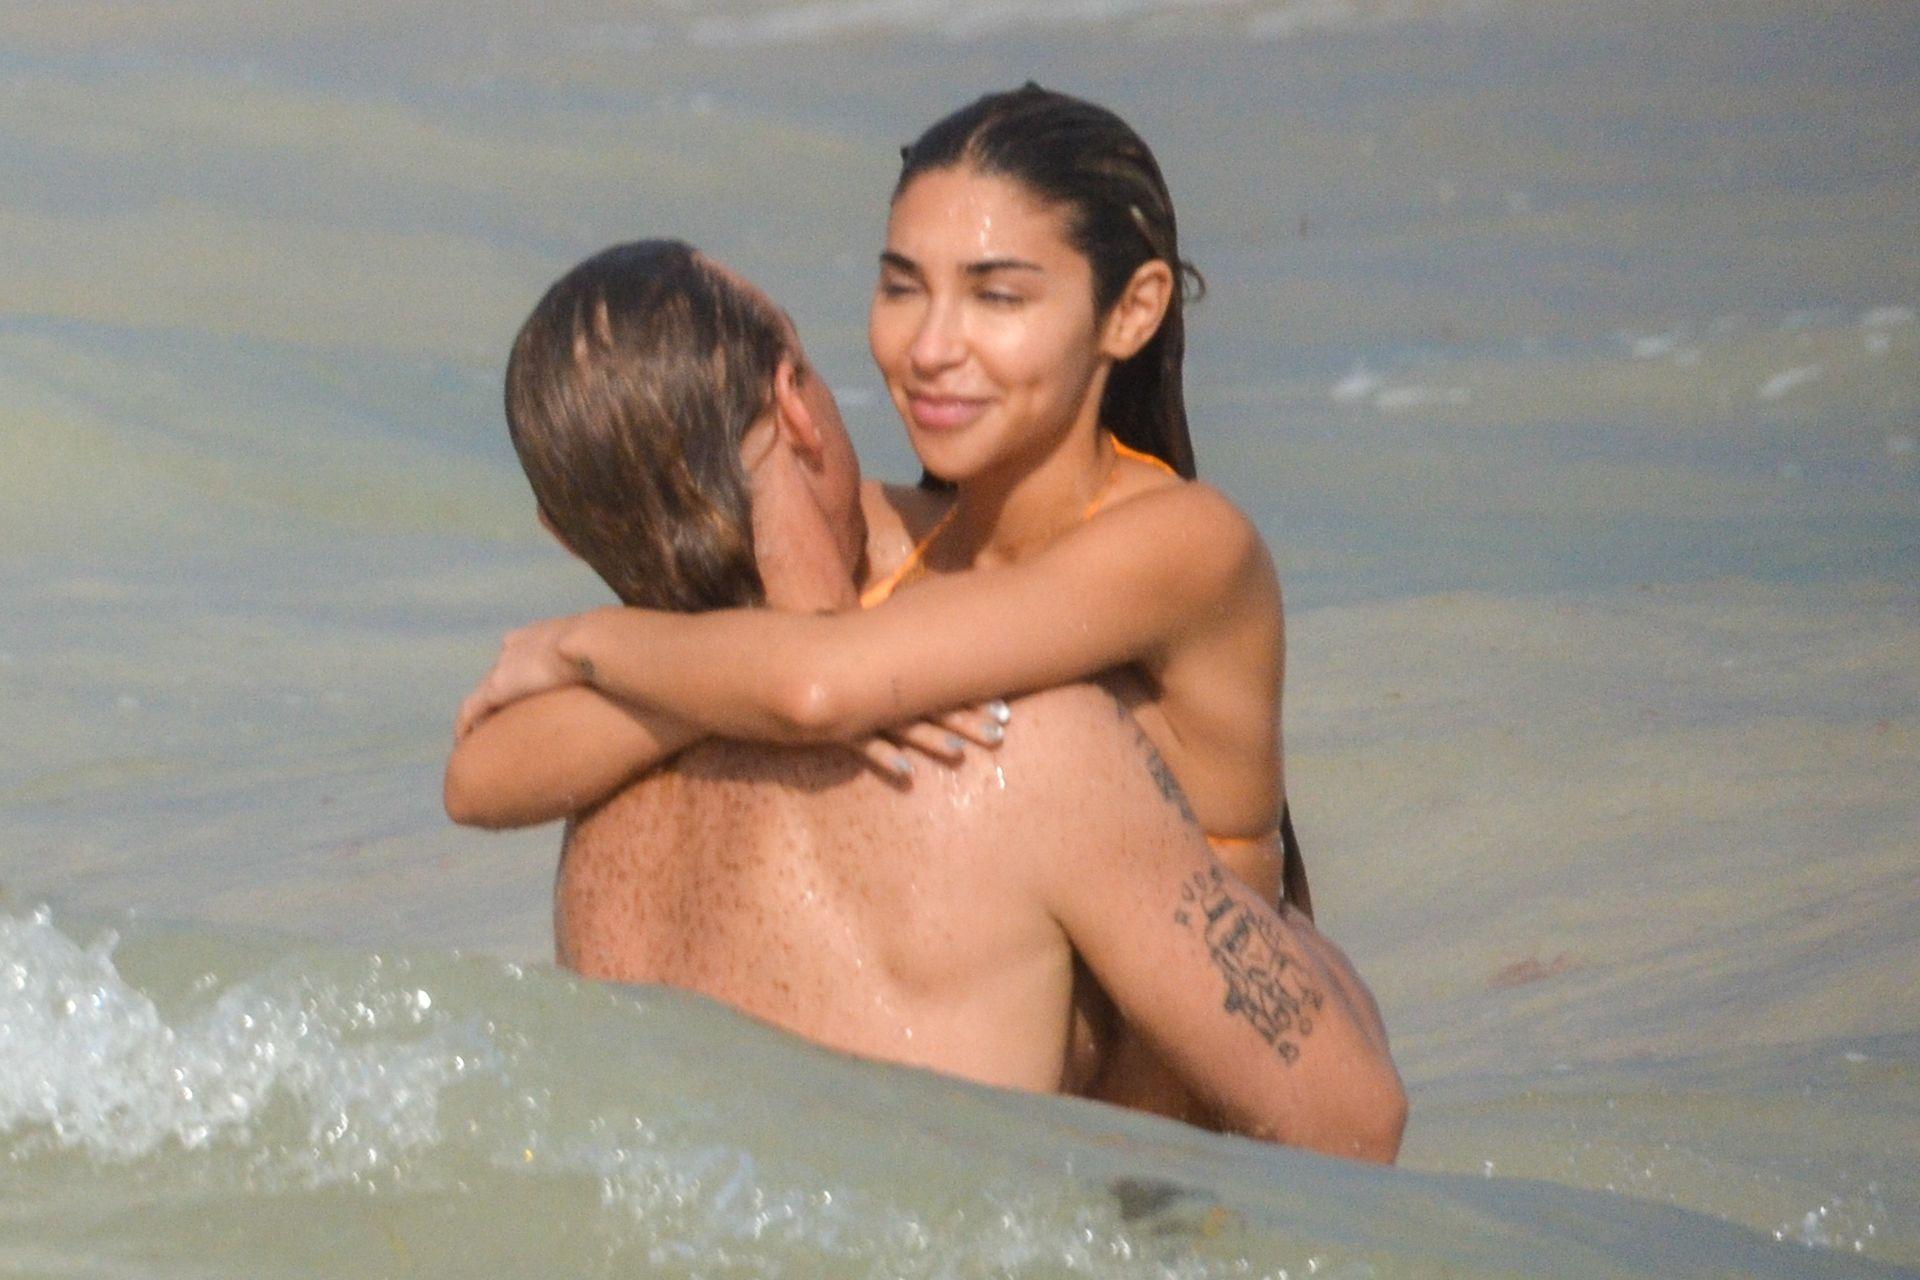 Chantel Jeffries And Dj Diplo Take Their New Love To Mexico 0031